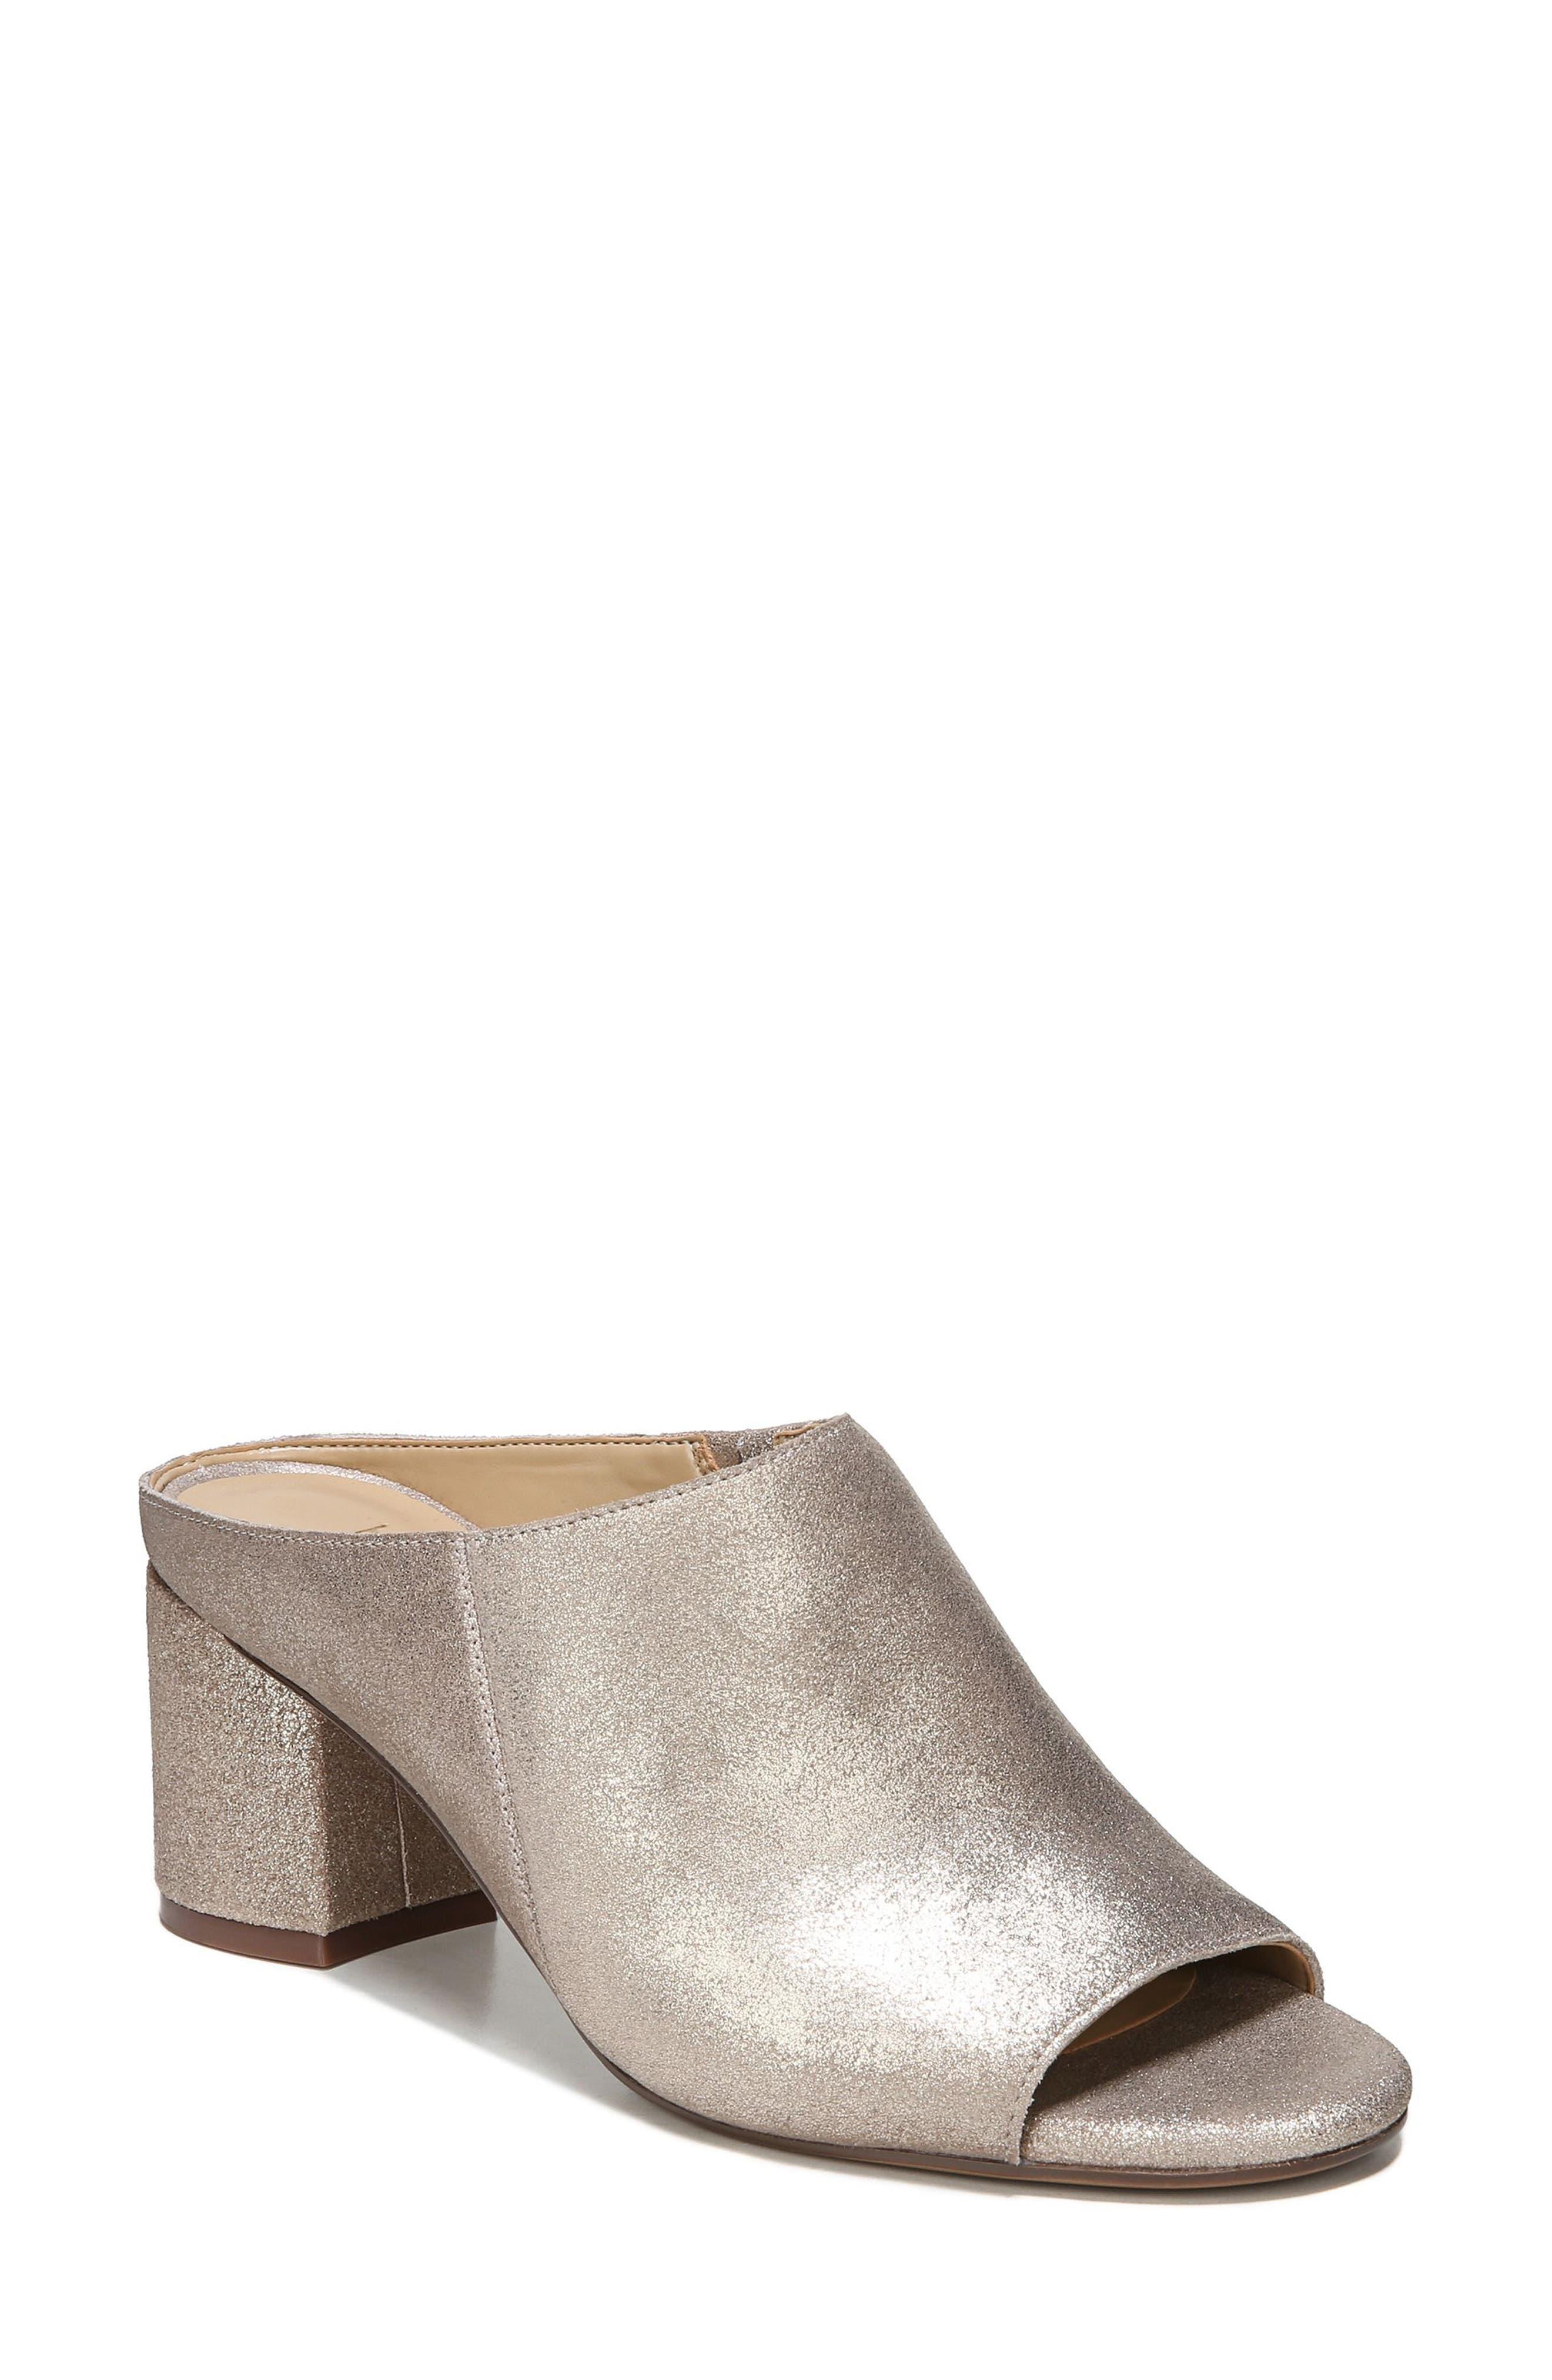 Alternate Image 1 Selected - Naturalizer Cyprine Slide Sandal (Women)